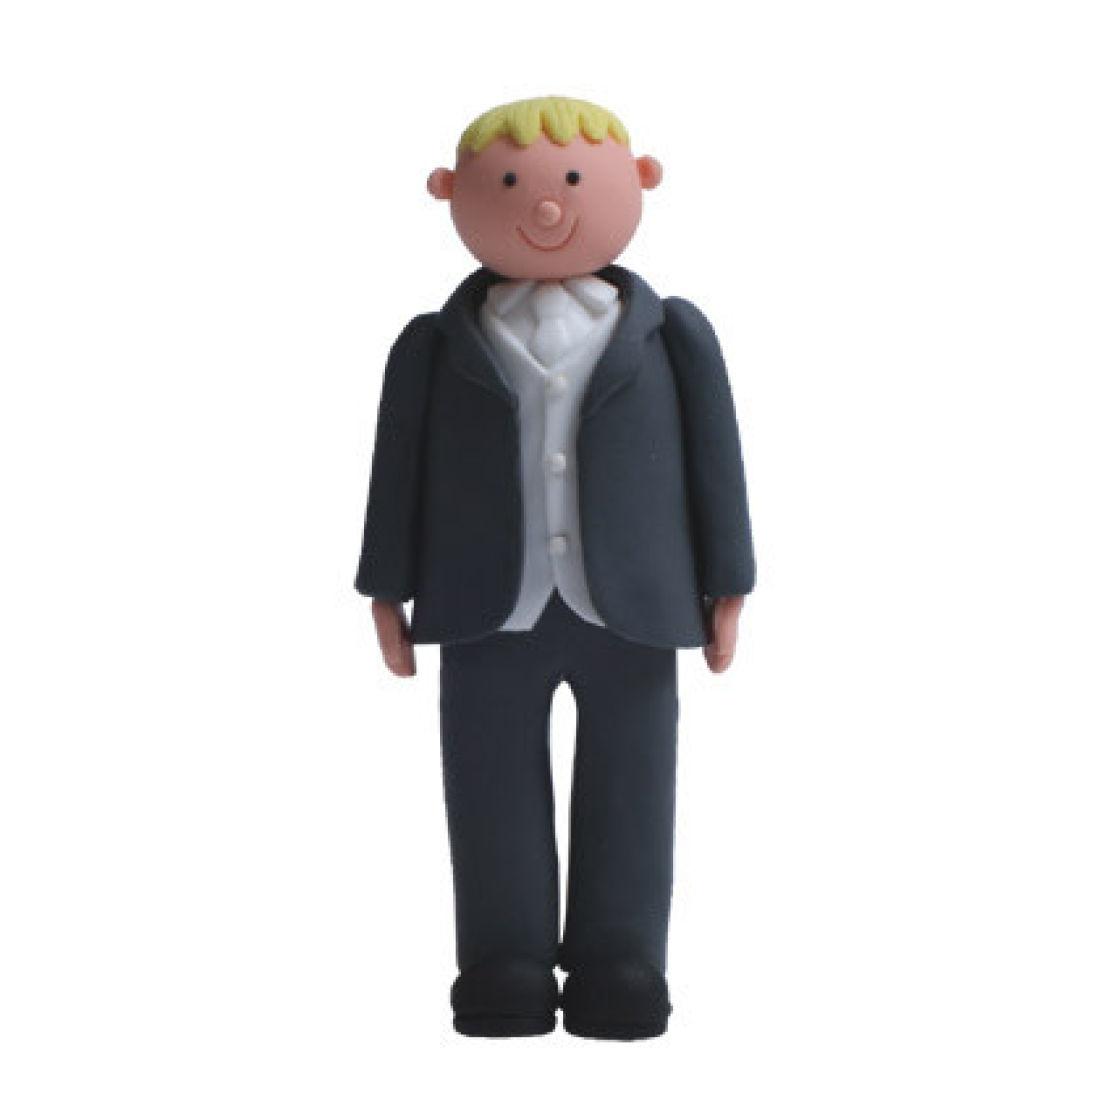 Claydough Groom Cake Topper - Blond Hair | Squires Kitchen Shop